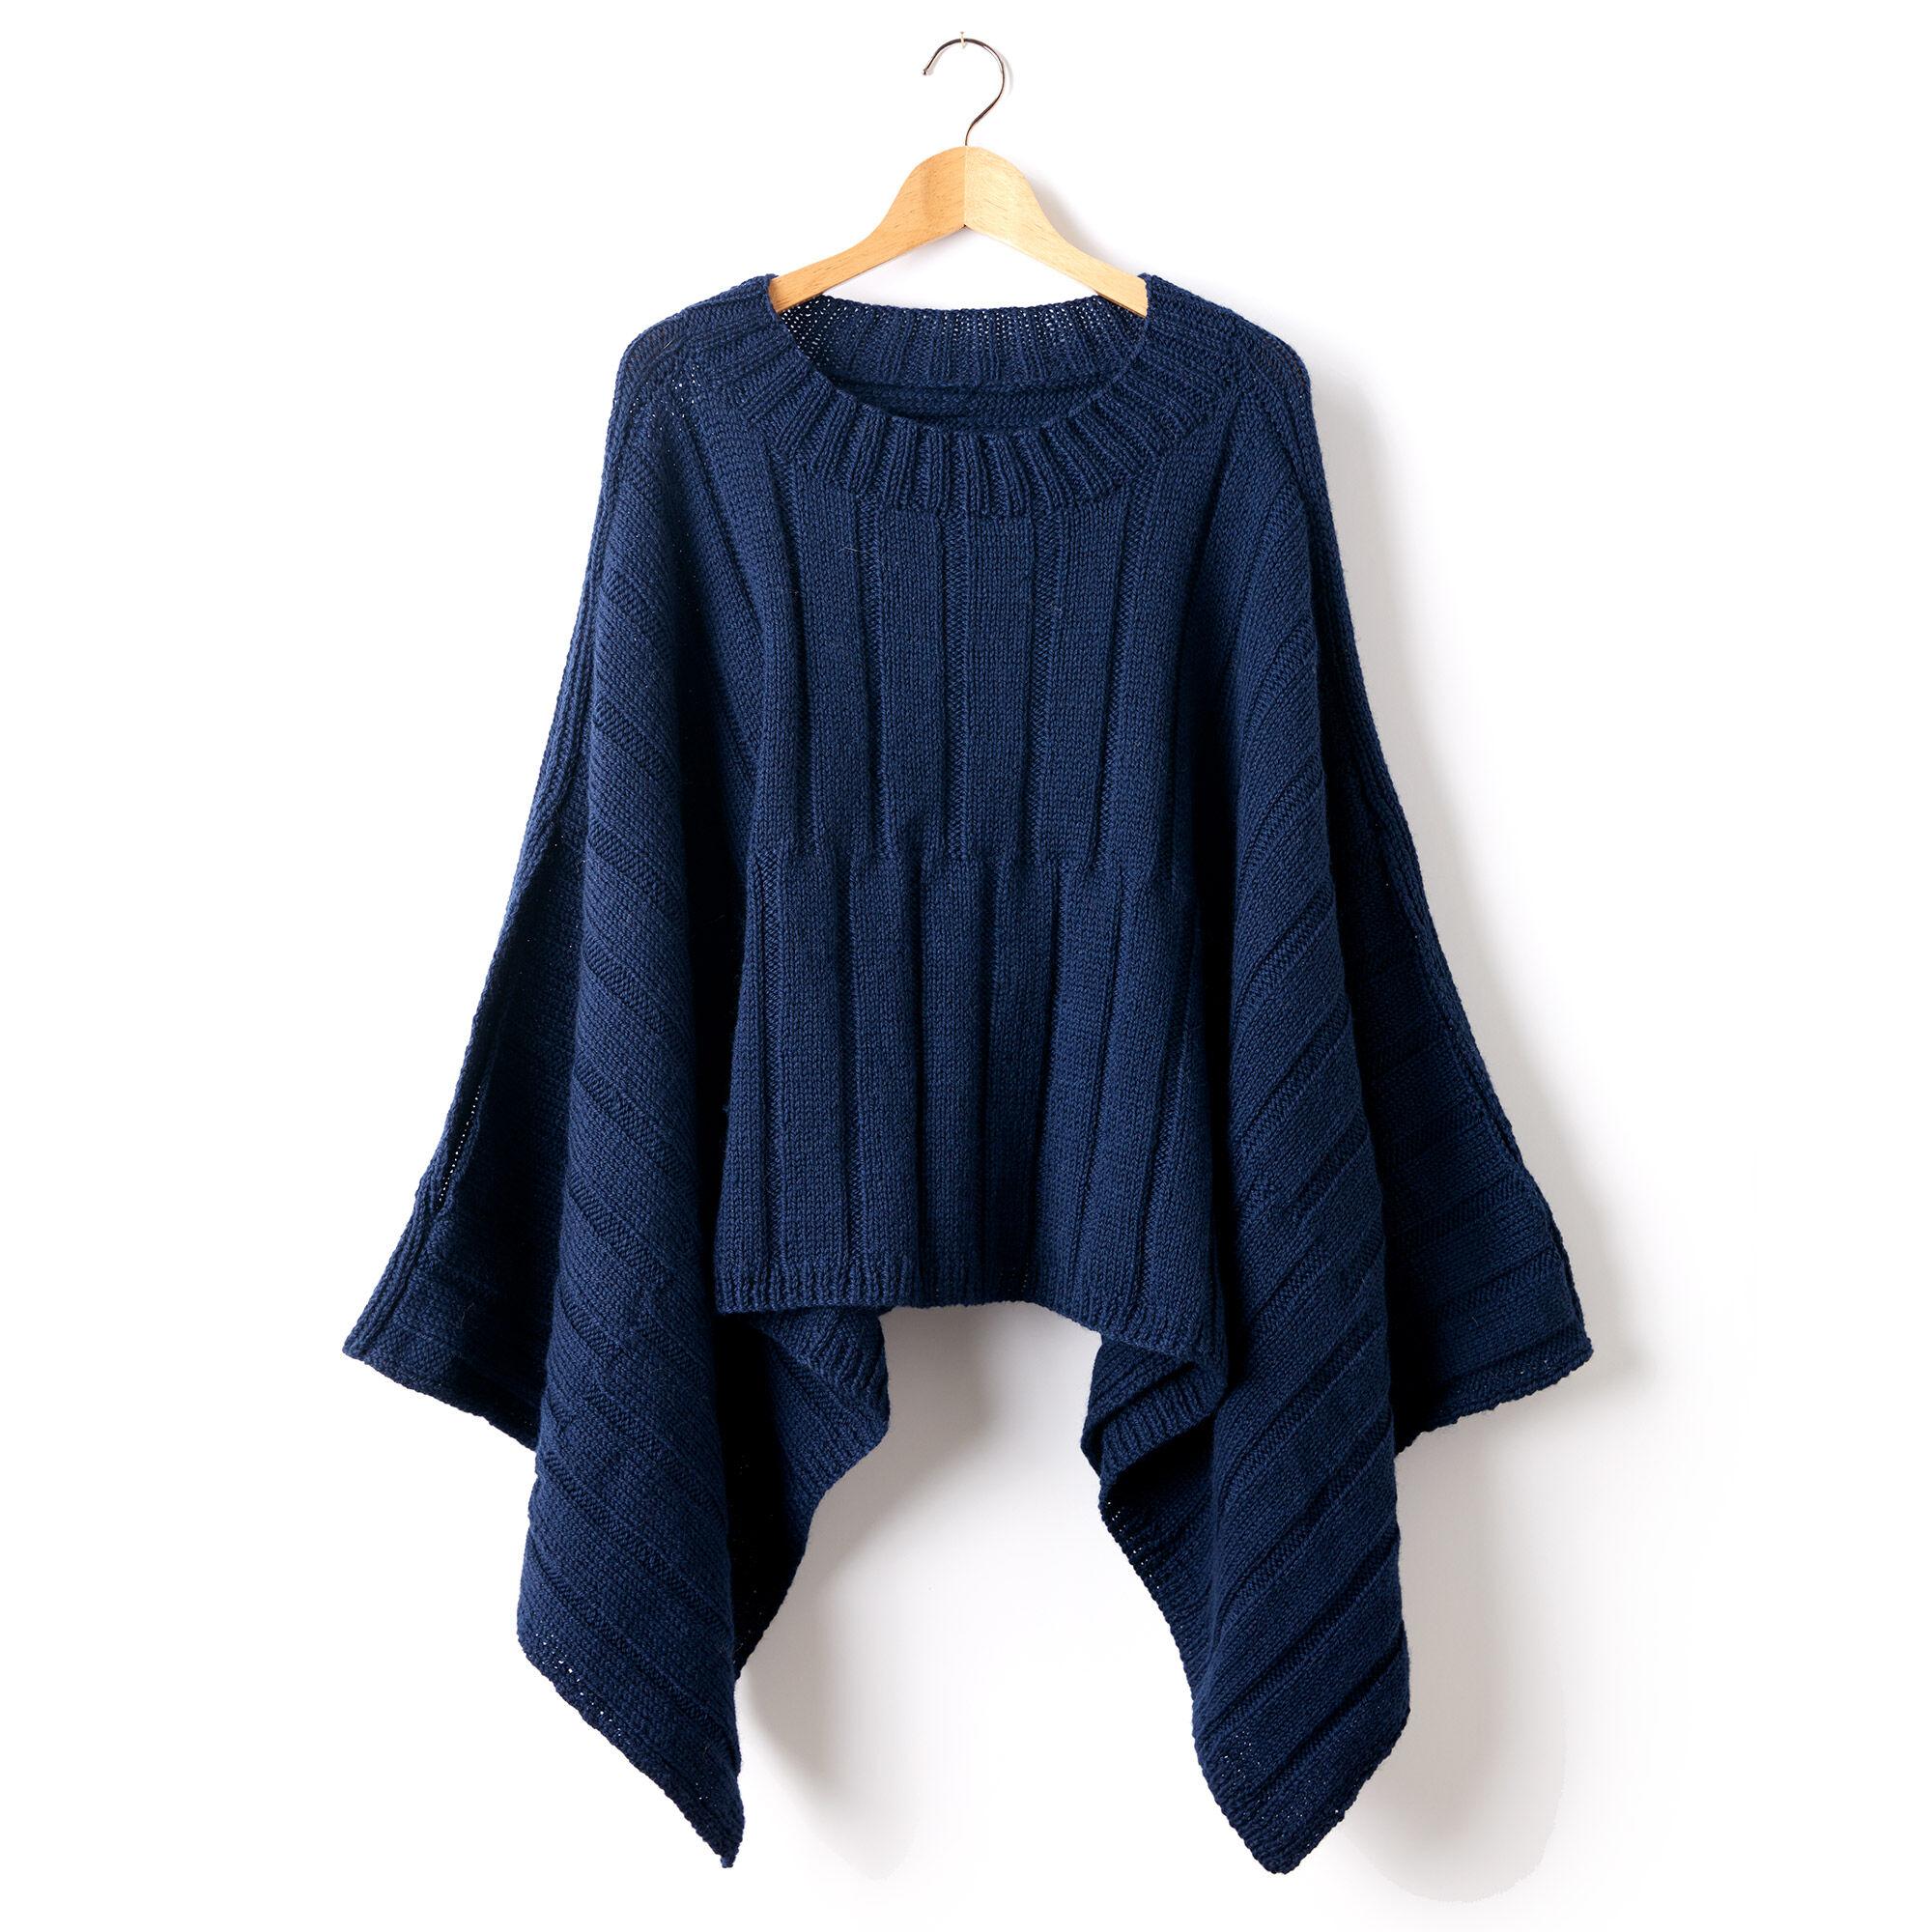 Patons Reversible Ribbed Knit Poncho, XS/S/M | Yarnspirations